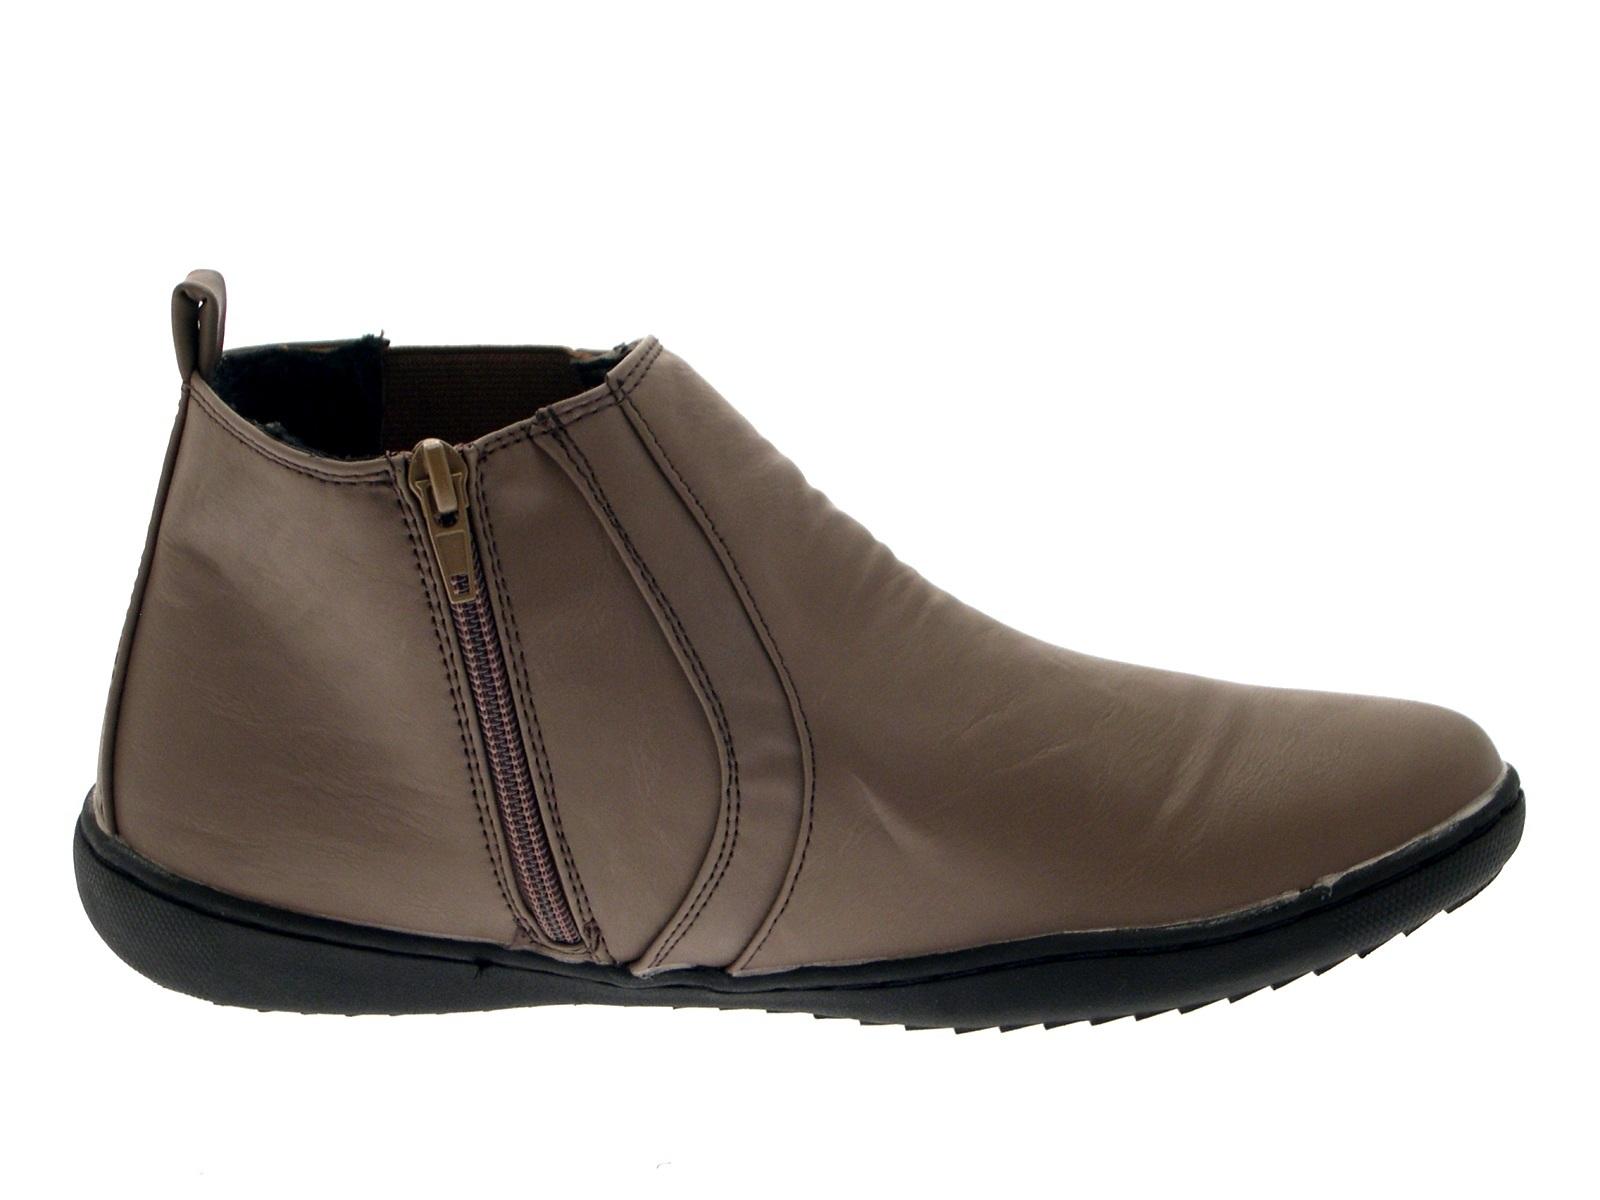 Comfortable Ladies Shoes Size